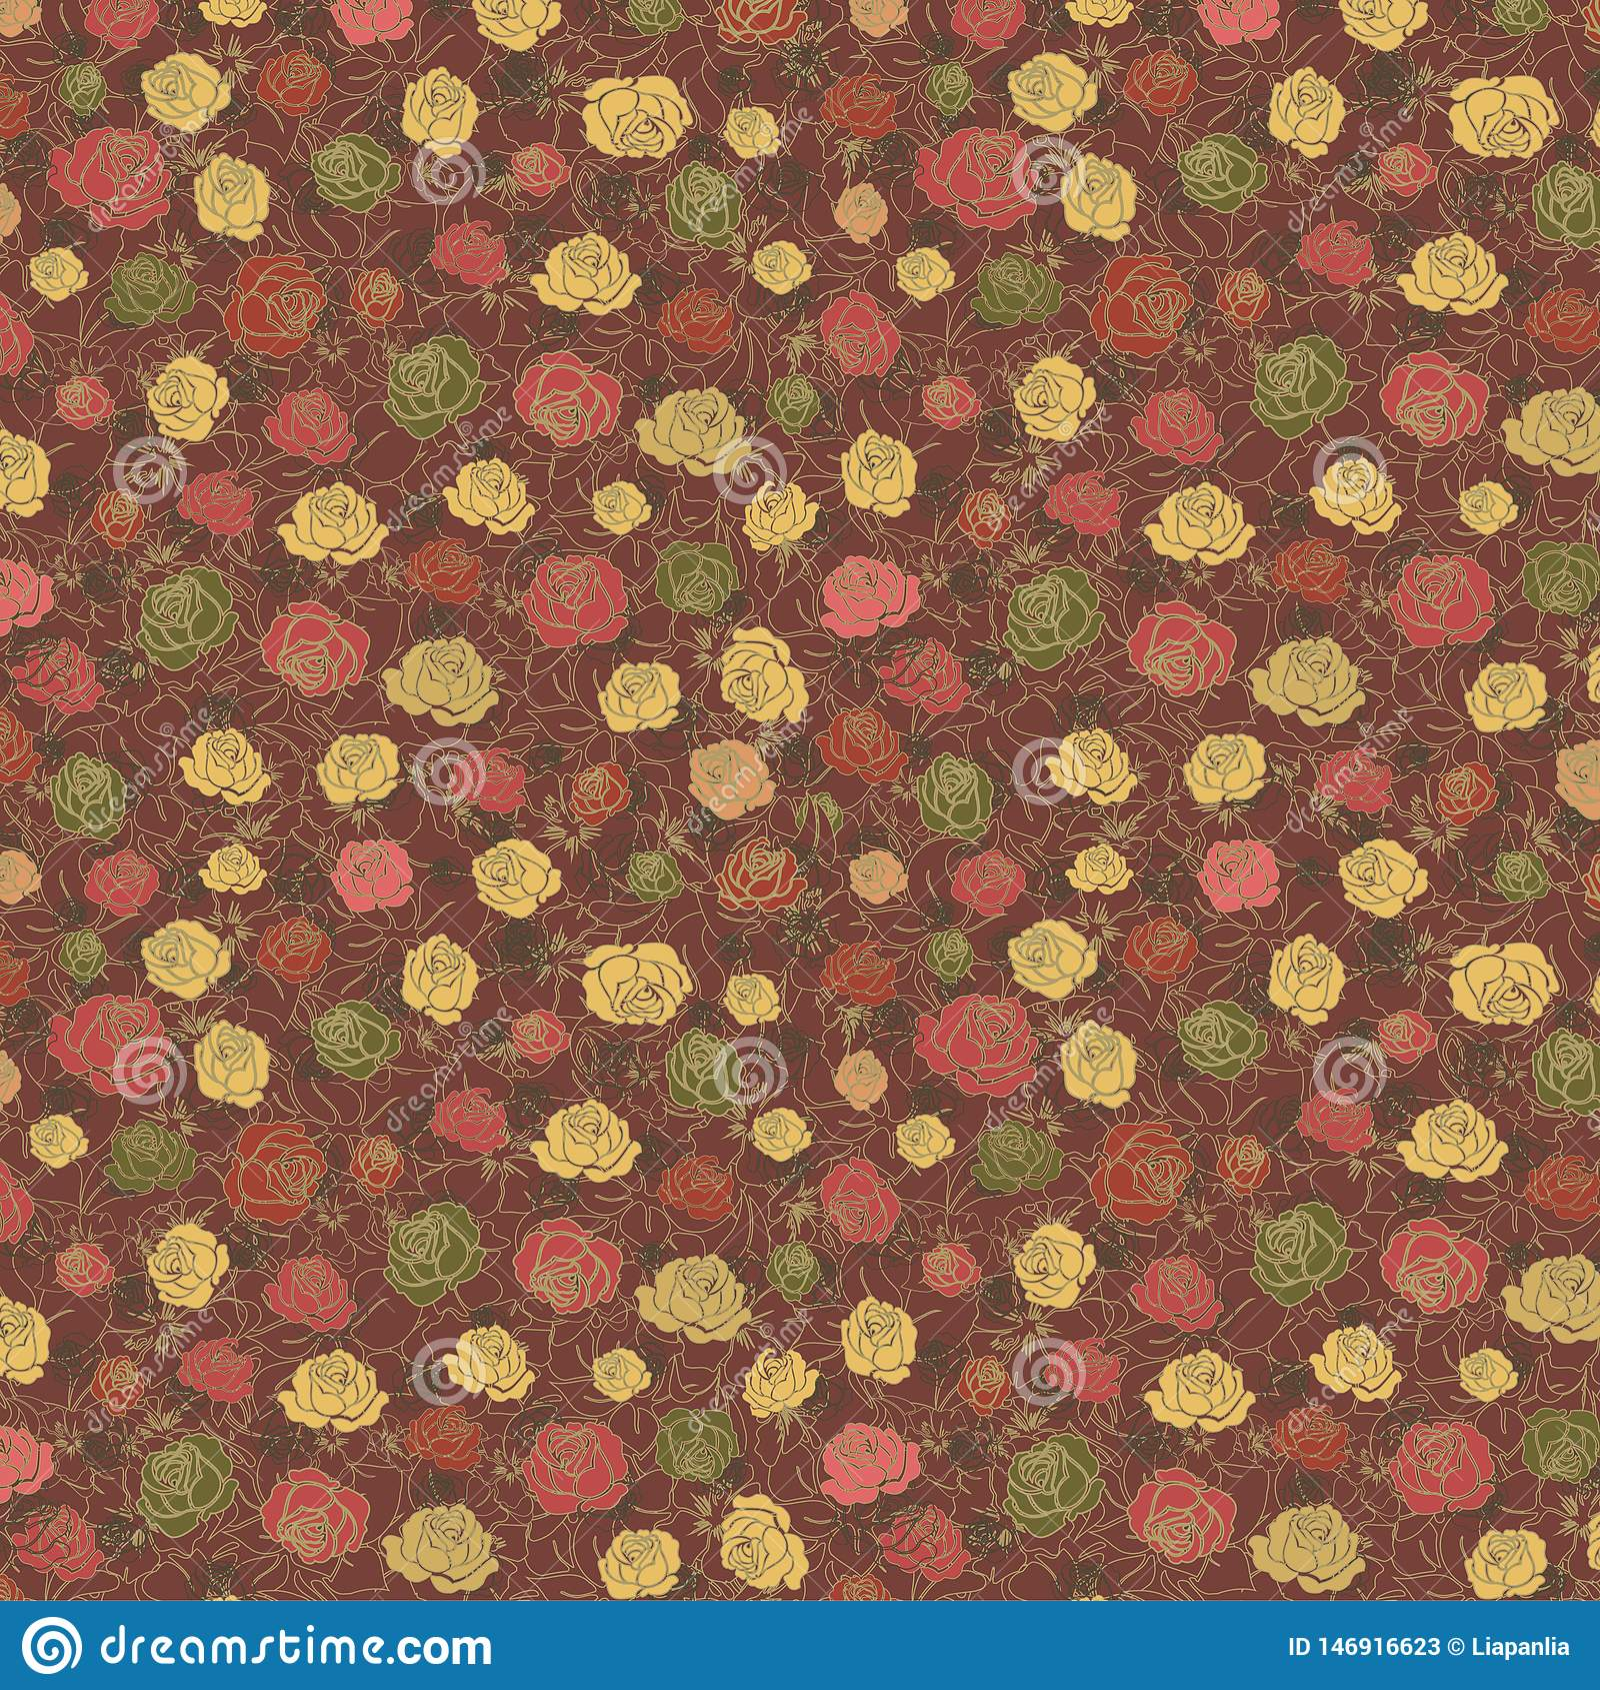 Floral σχέδιο με τα χρωματισμένα τριαντάφυλλα